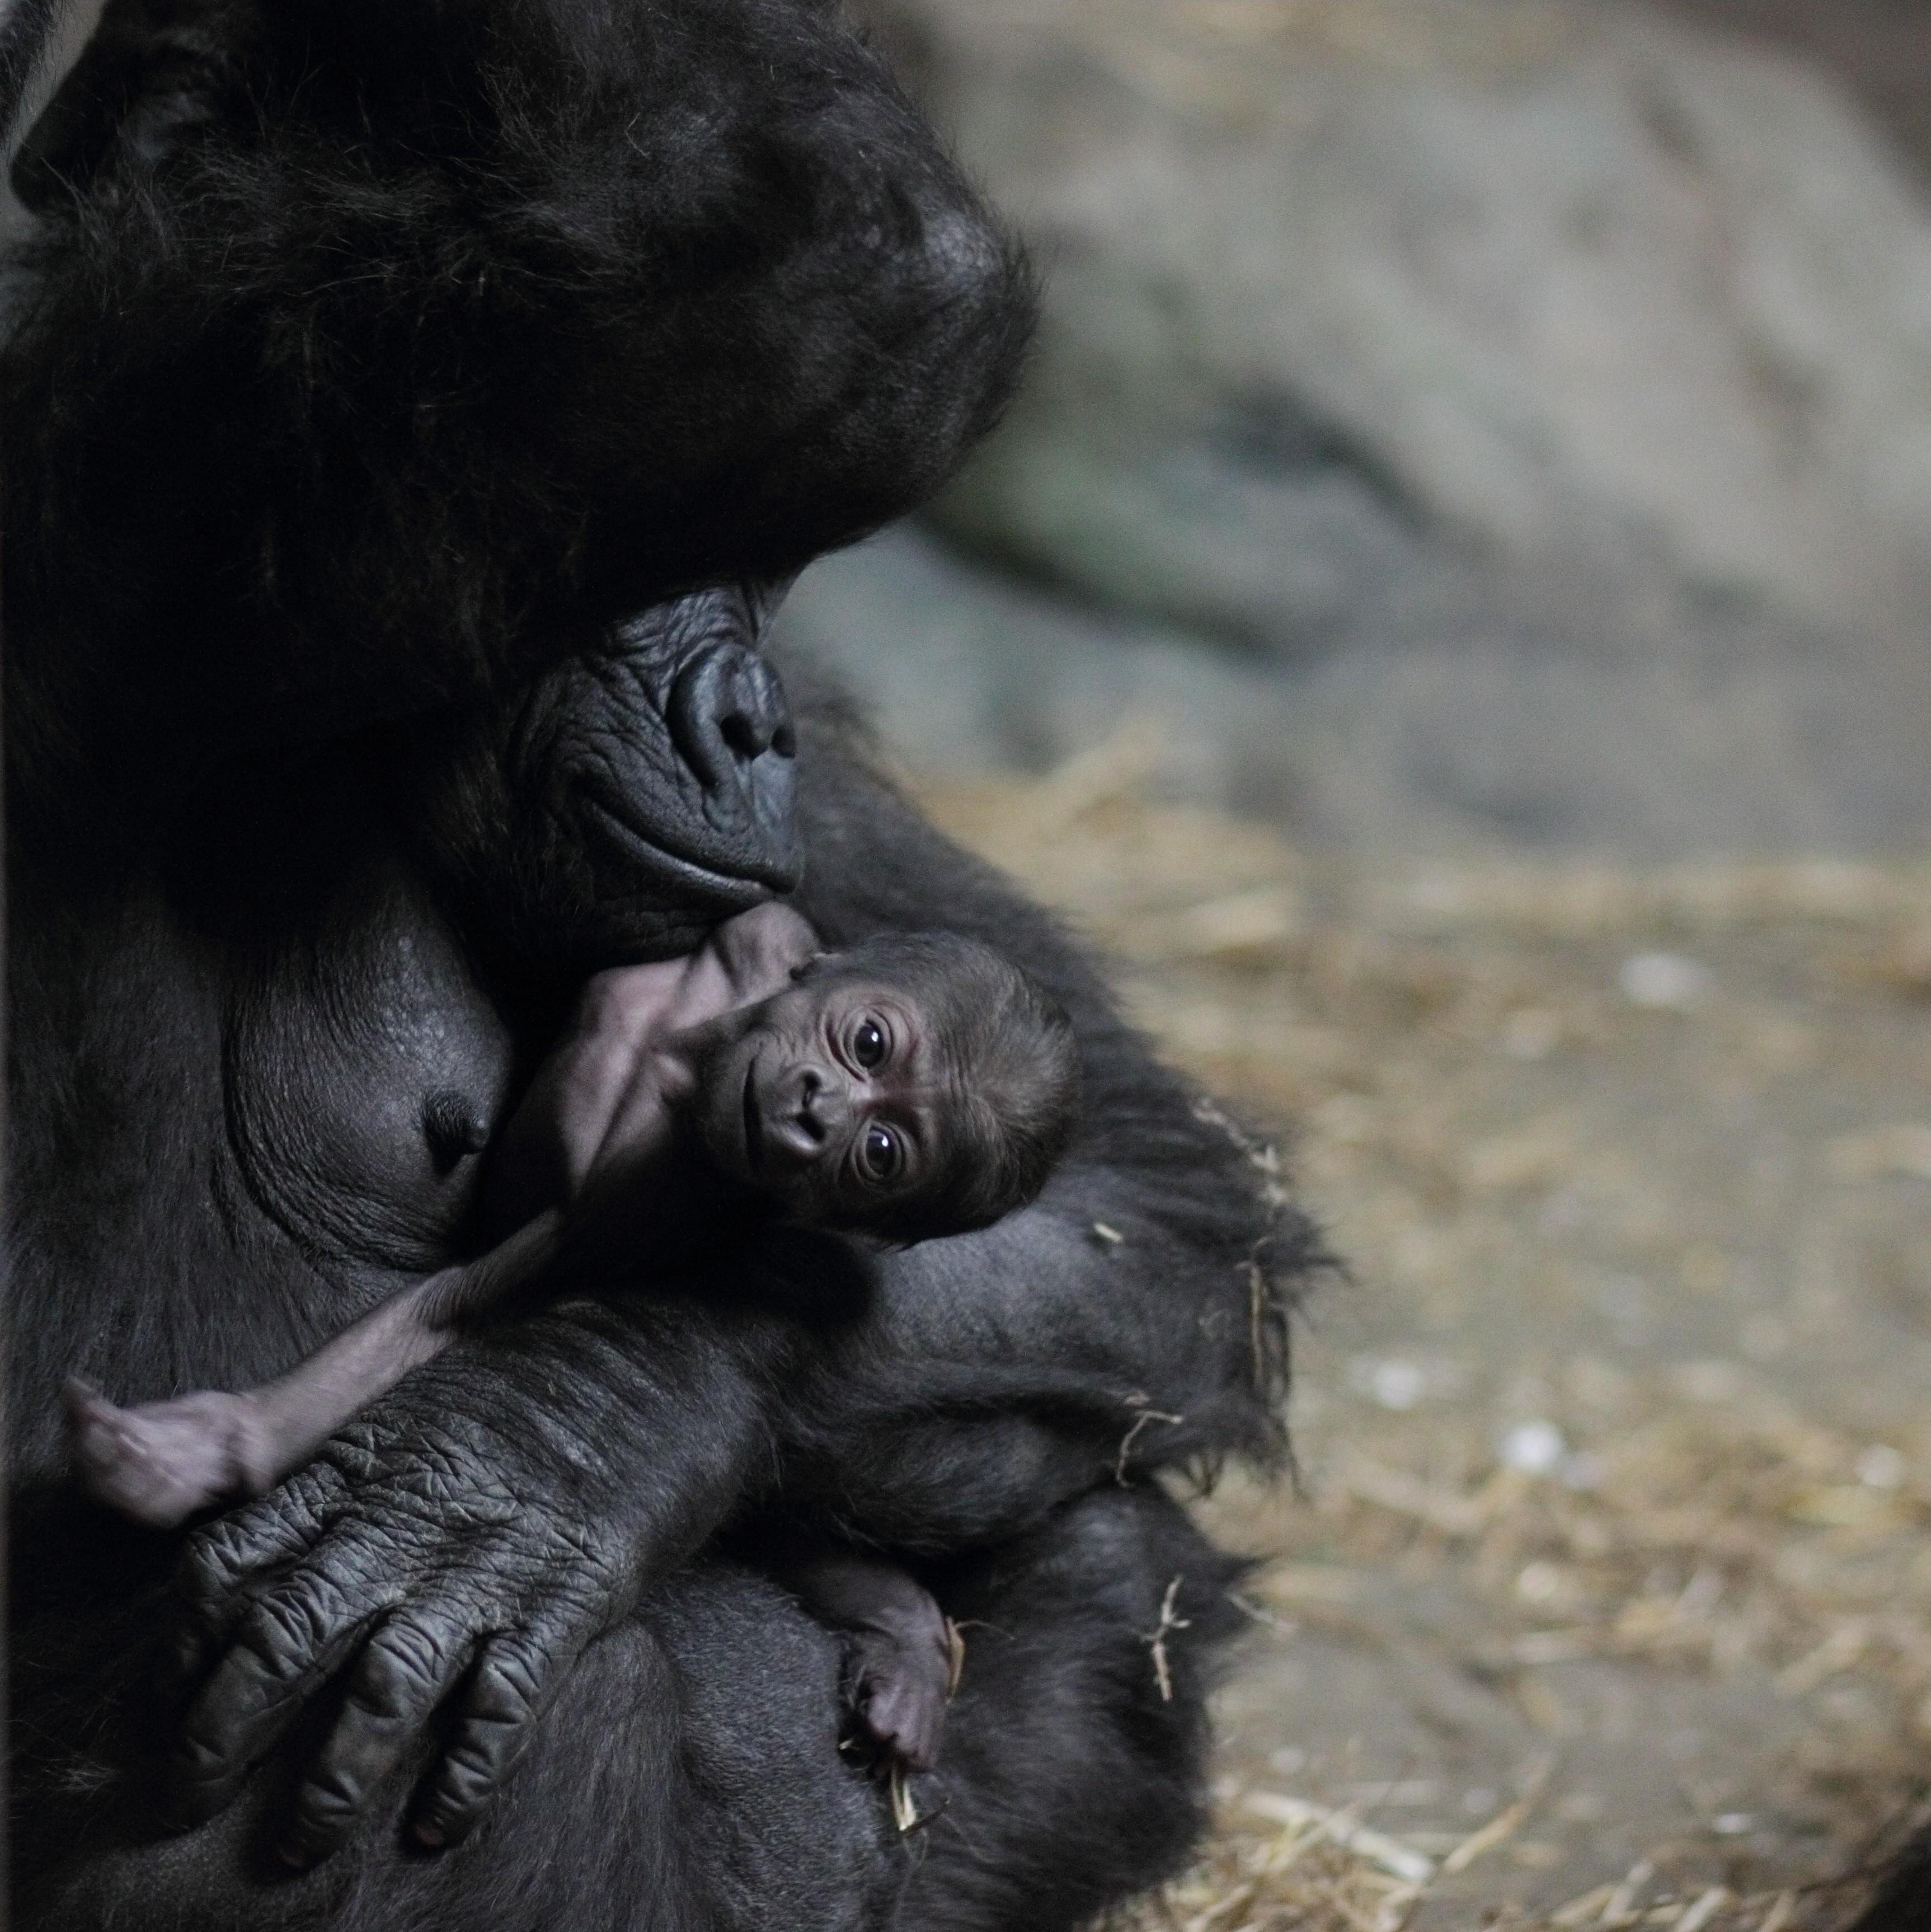 File:Moka with baby gorilla at Pittsburgh Zoo 12, 2012-02 ... Newborn Silverback Gorilla